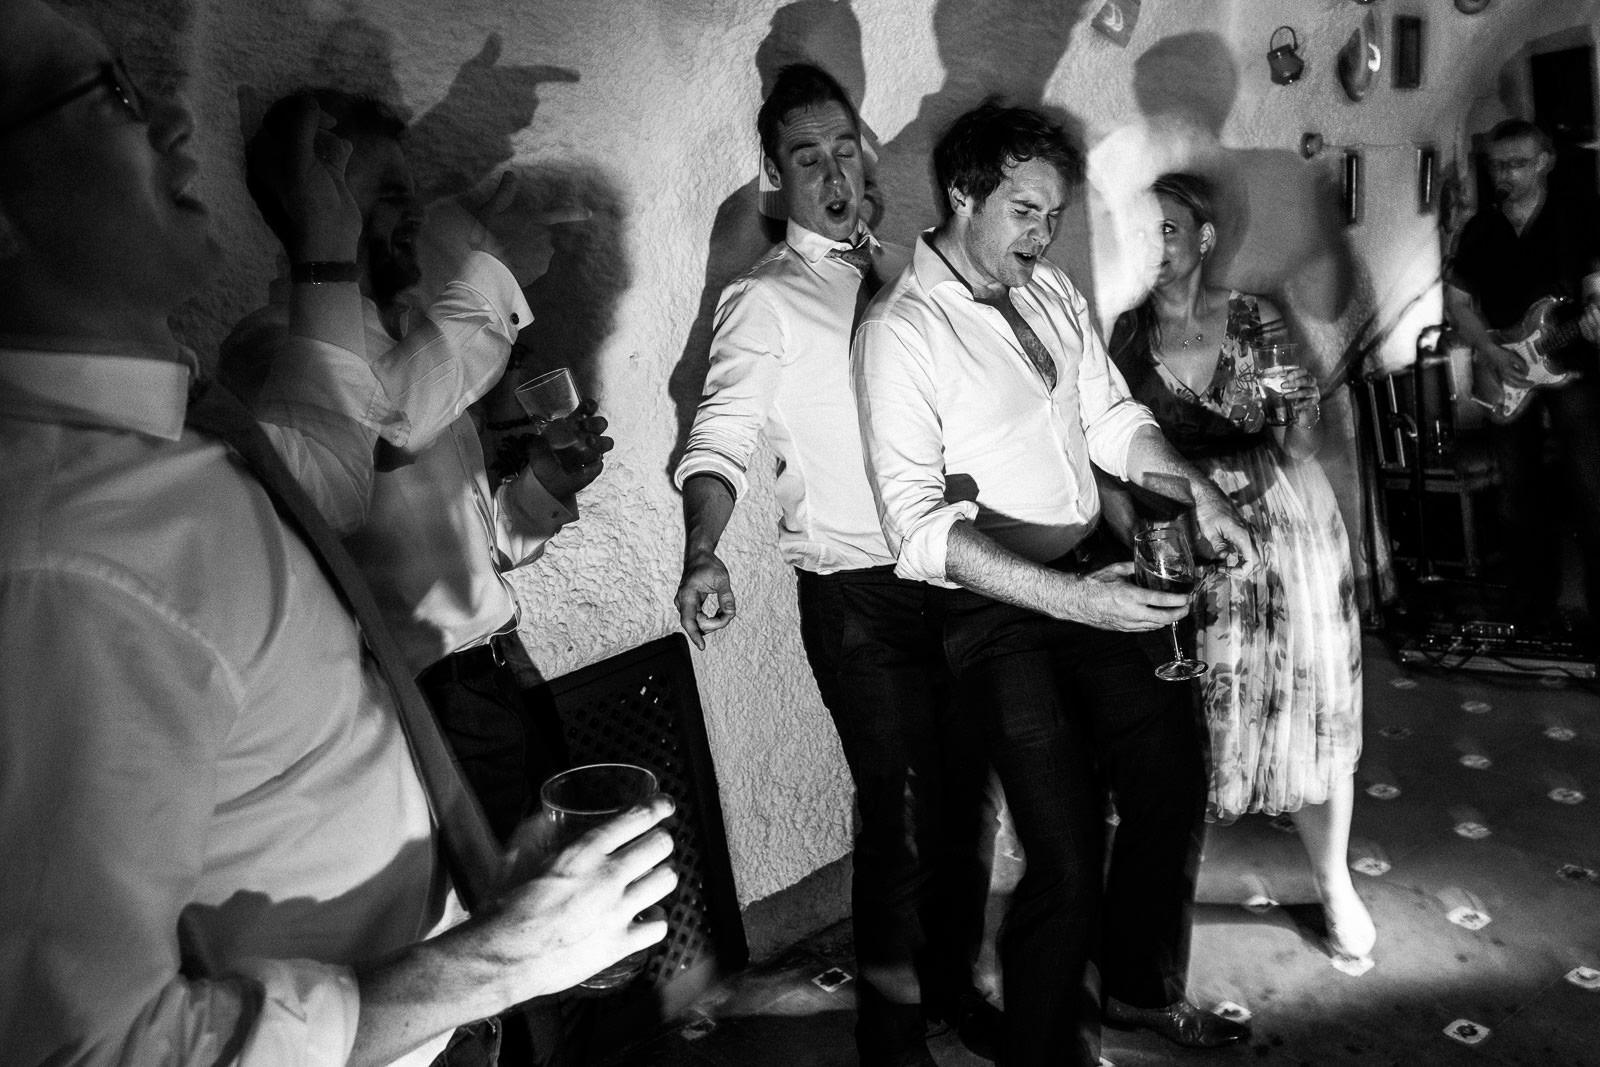 granada_destination_wedding_spain_072